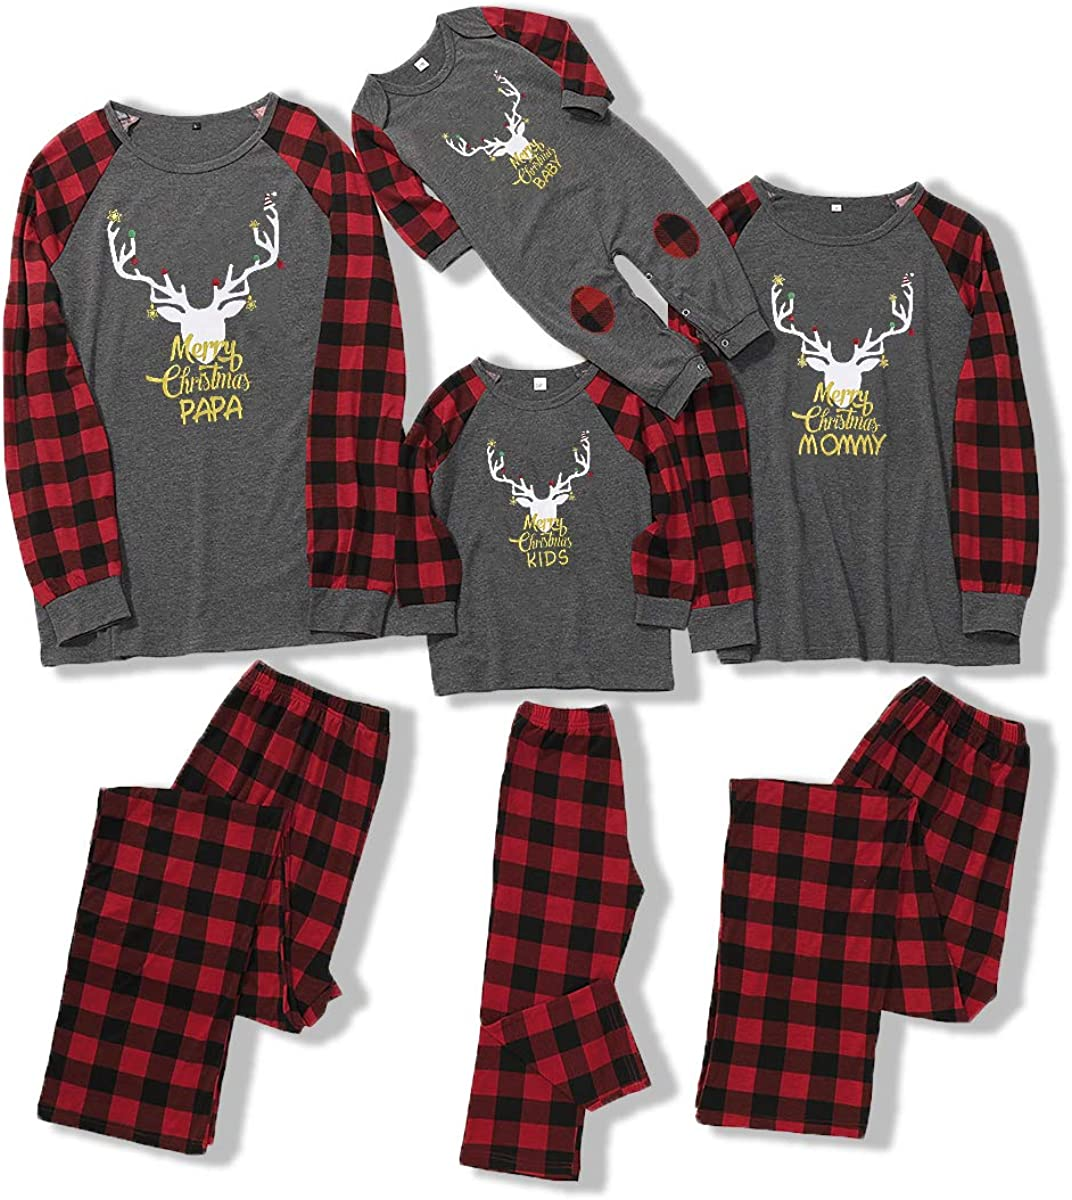 SOONHUA Family Christmas Matching Outfits Elk Plaid Nightwear Xmas Pajamas Set for Women Men Kid Baby Christmas Pajamas